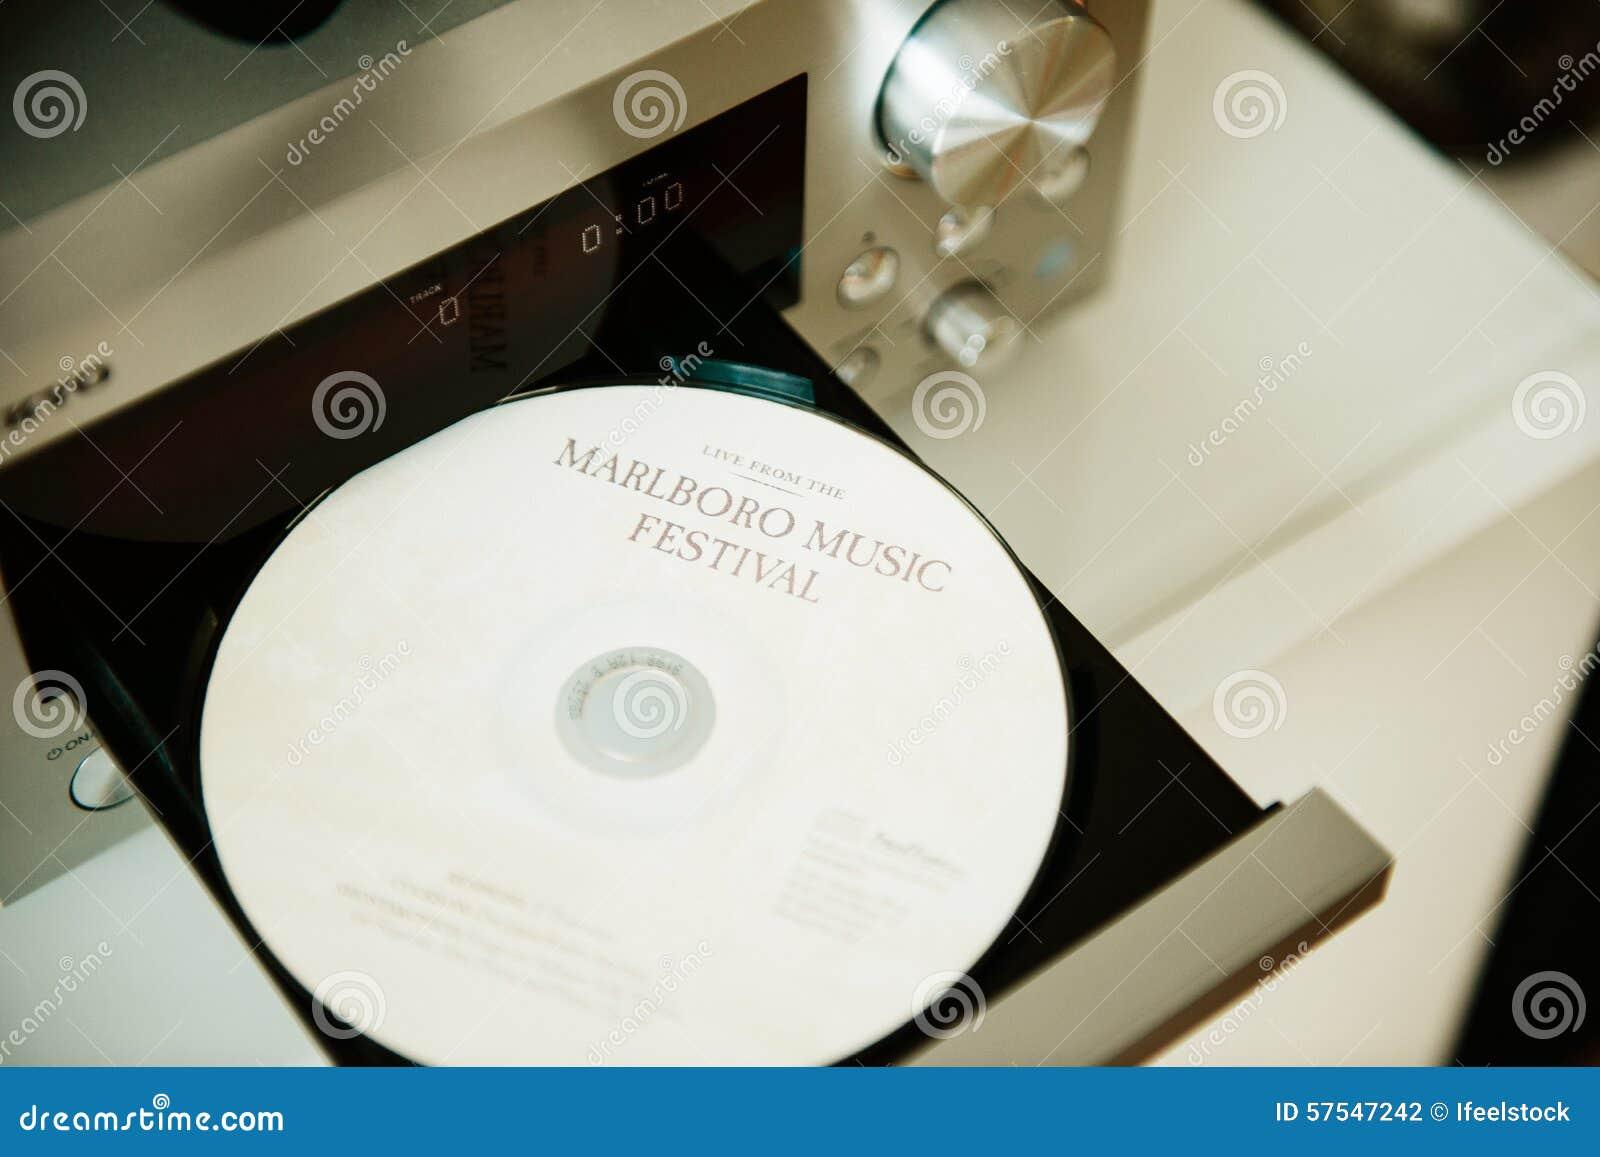 CD del festival de música de Marlboro en bandeja del lector de cd